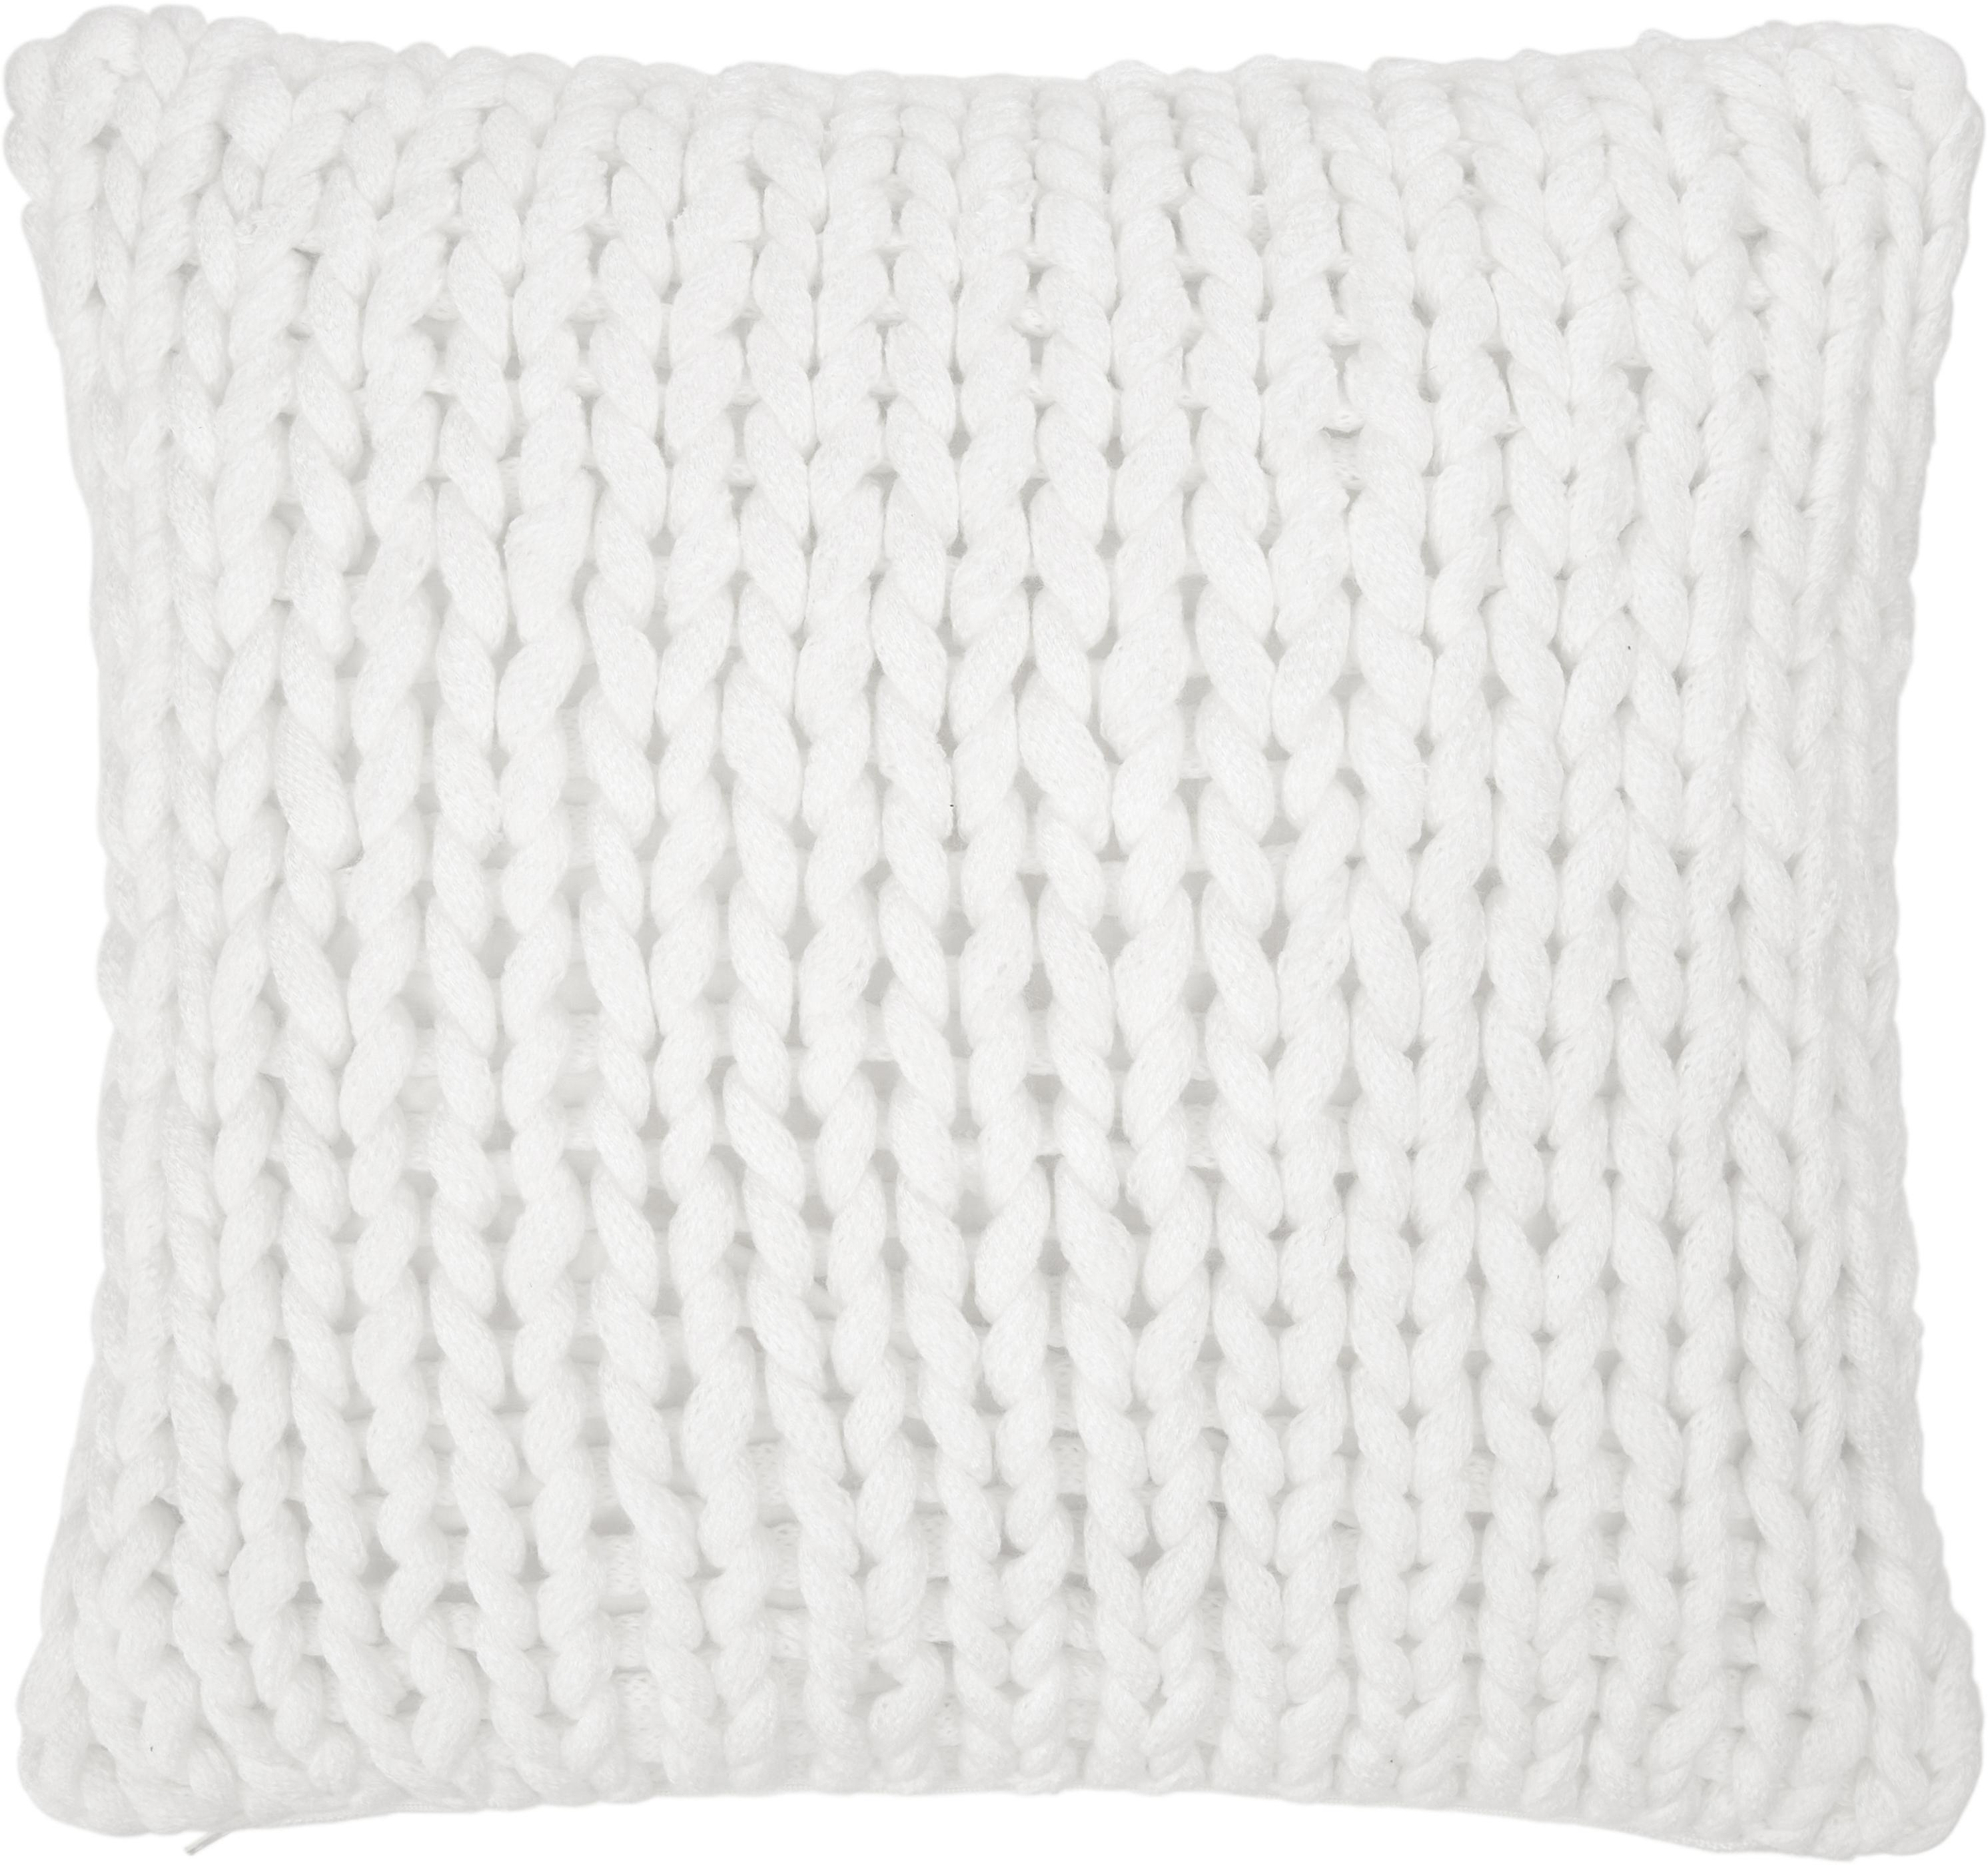 Federa arredo a maglia grossa bianca Adyna, 100% poliacrilico, Bianco crema, Larg. 45 x Lung. 45 cm